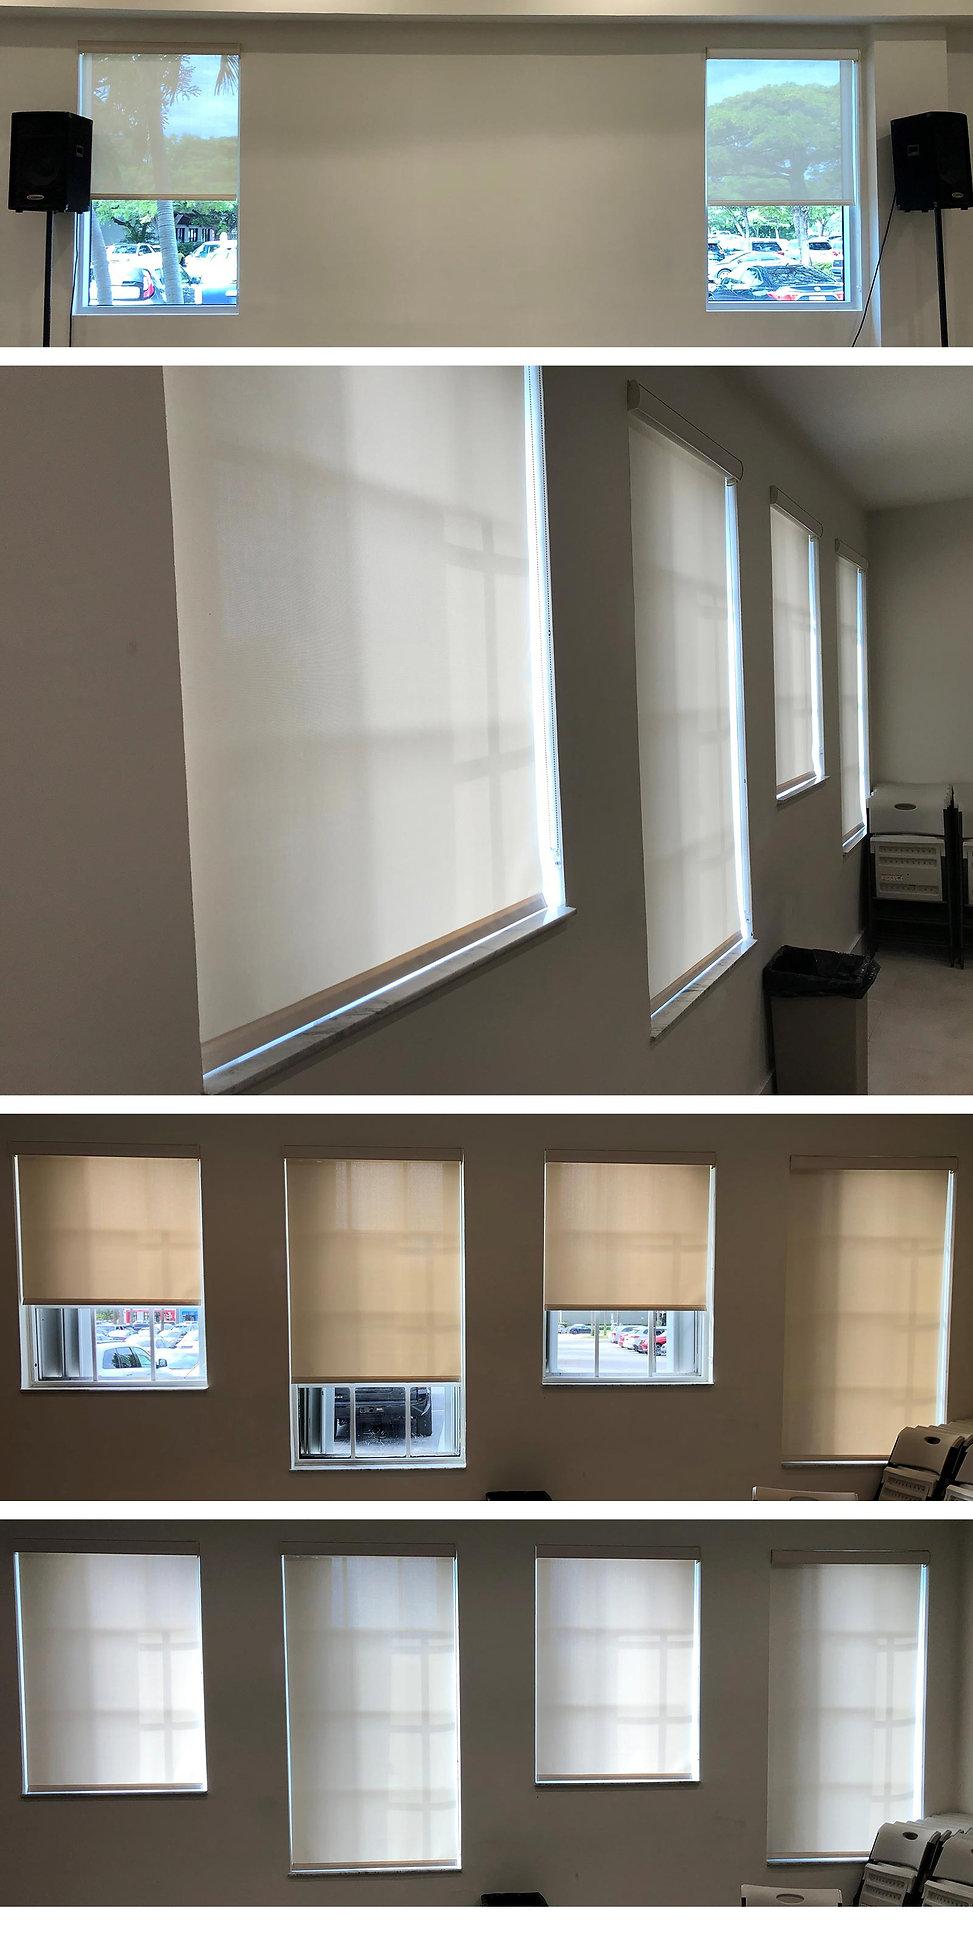 breslev-avenutra-window-shades.jpg